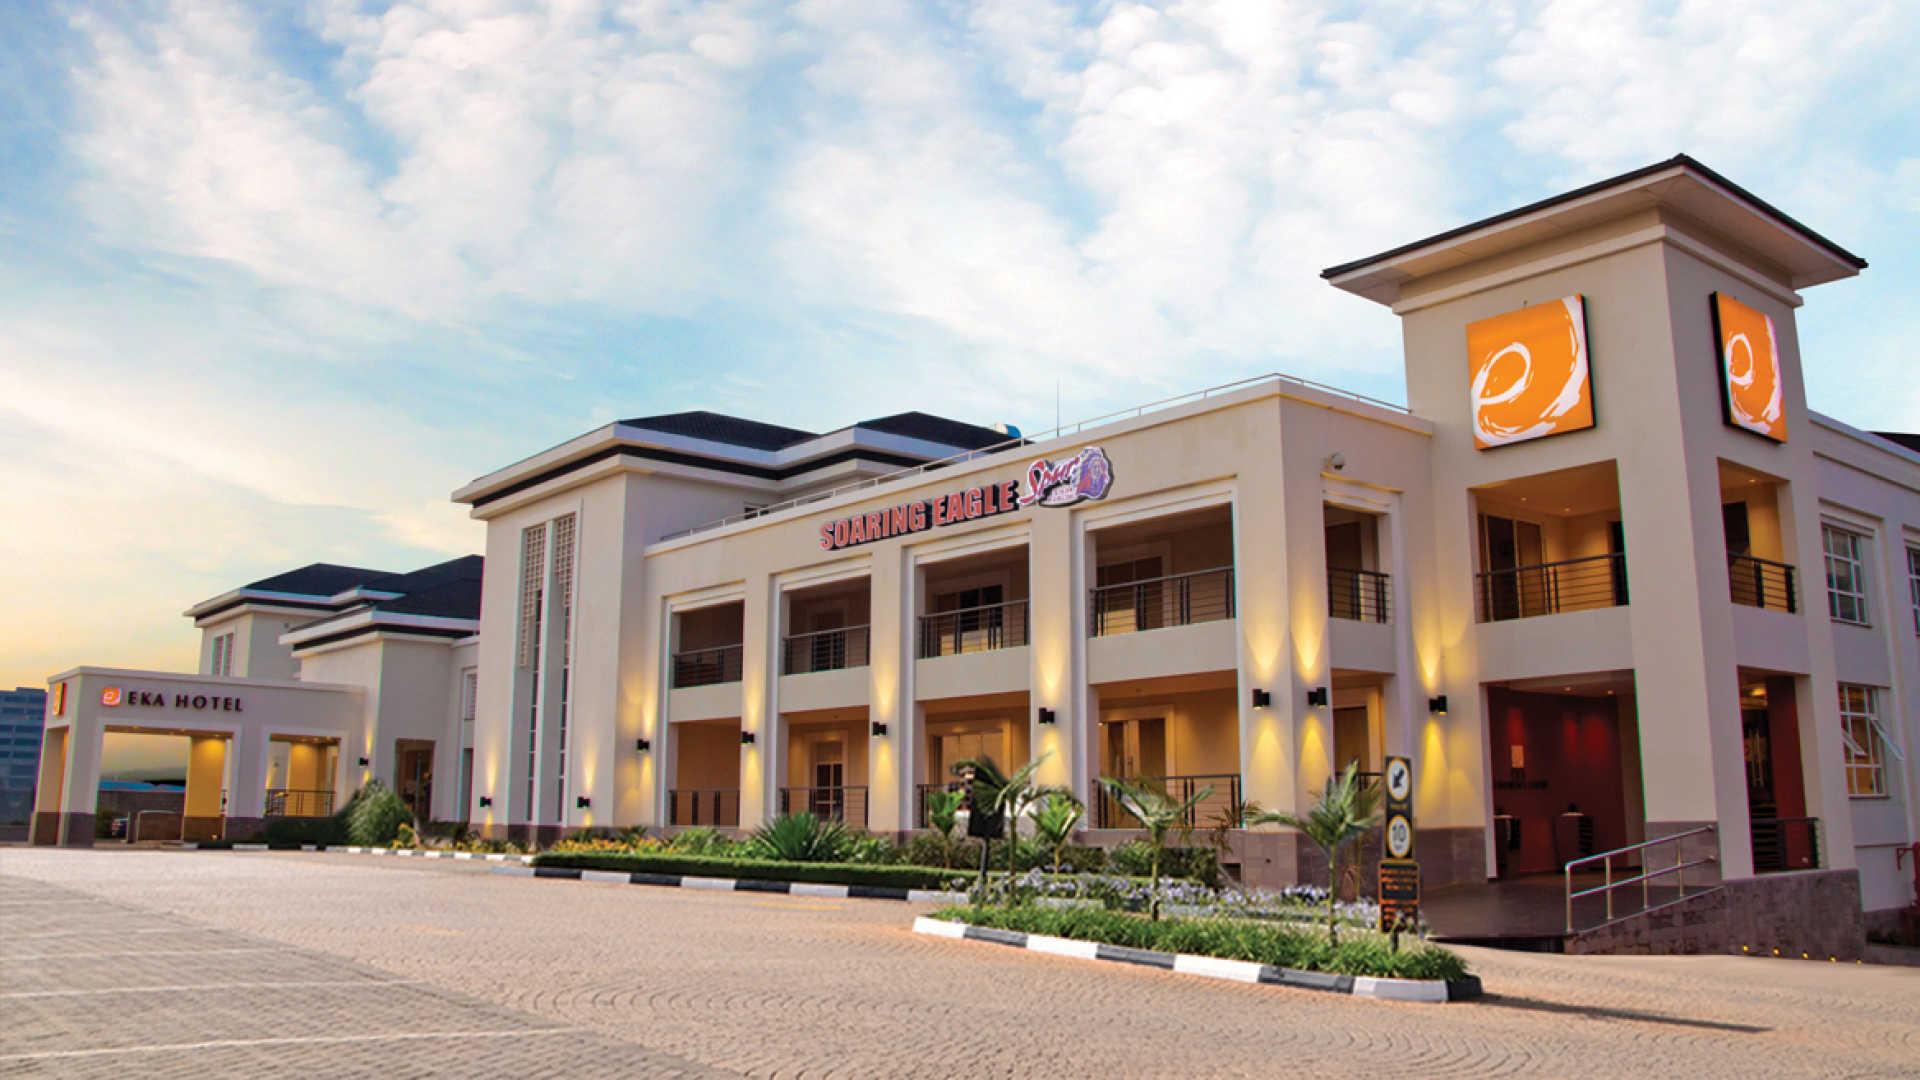 Eka hotels , Nairobi ,Kenya 2